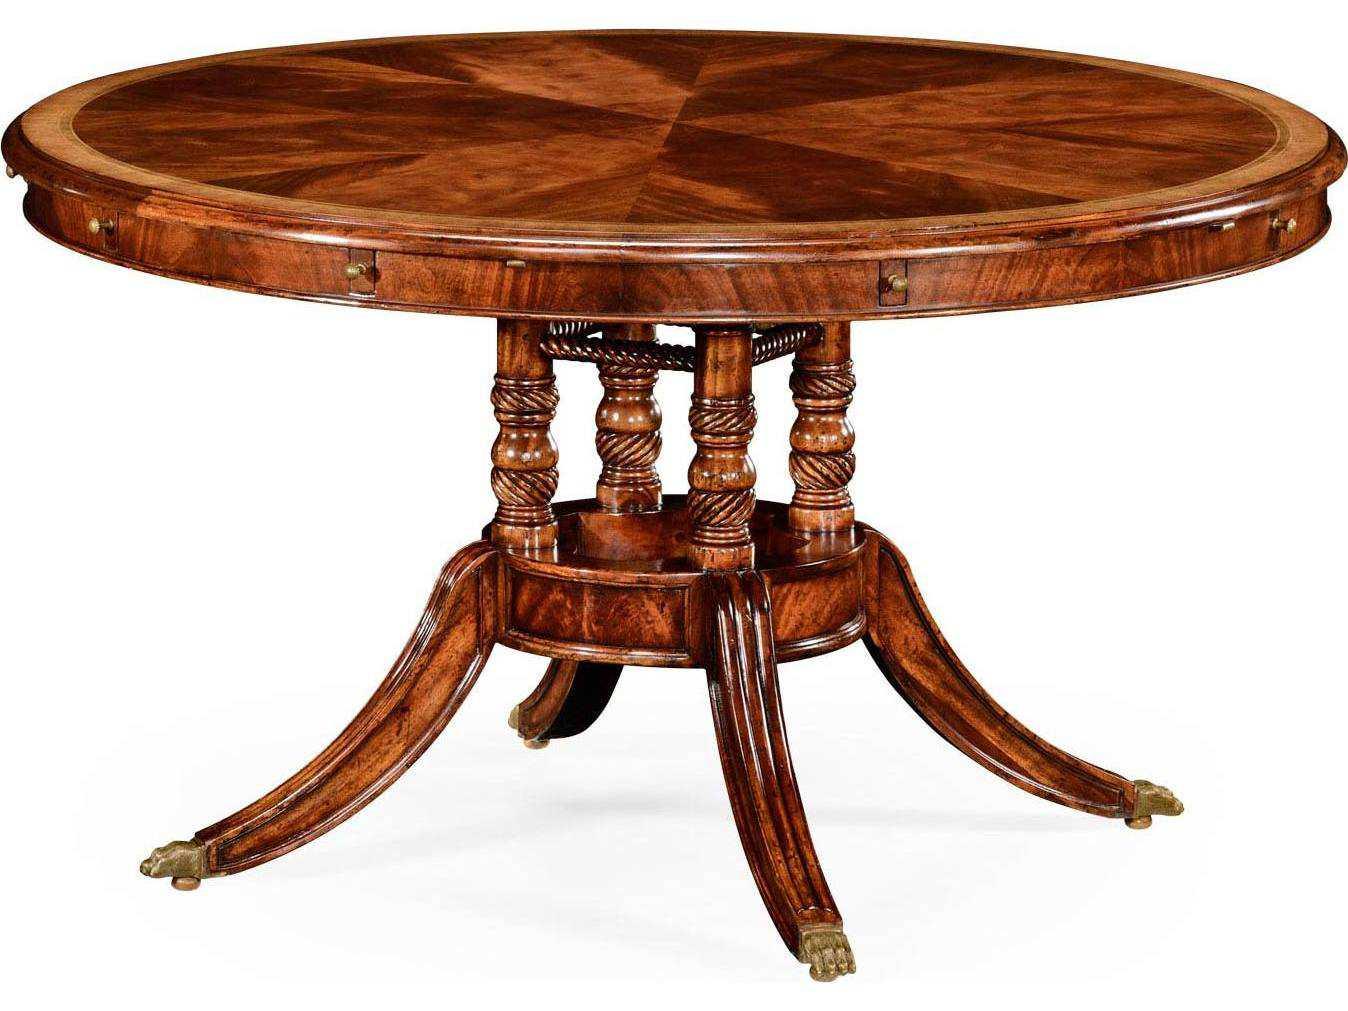 jonathan charles buckingham medium antique mahogany and satinwood 53 39 39 round to oval dining. Black Bedroom Furniture Sets. Home Design Ideas